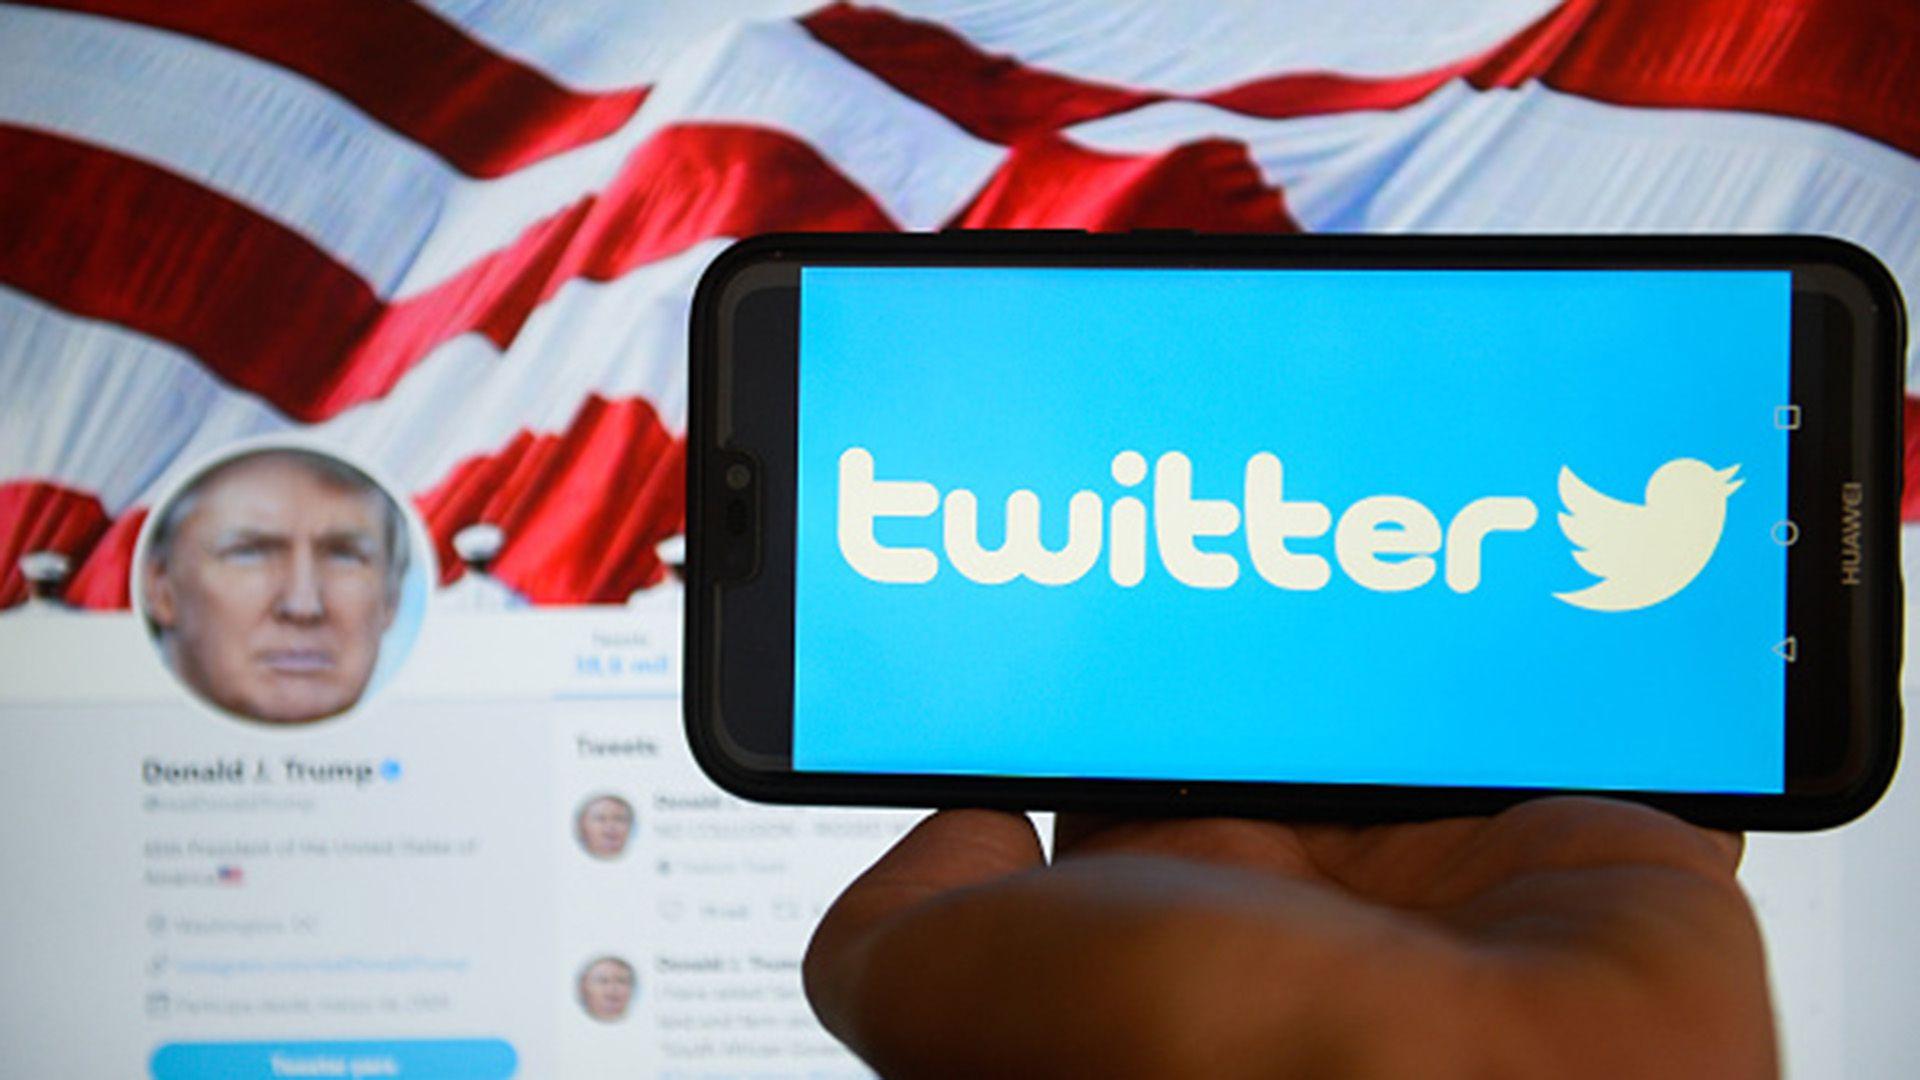 Trump ha causado varias polémicas a través de Twitter (Foto: Archivo)